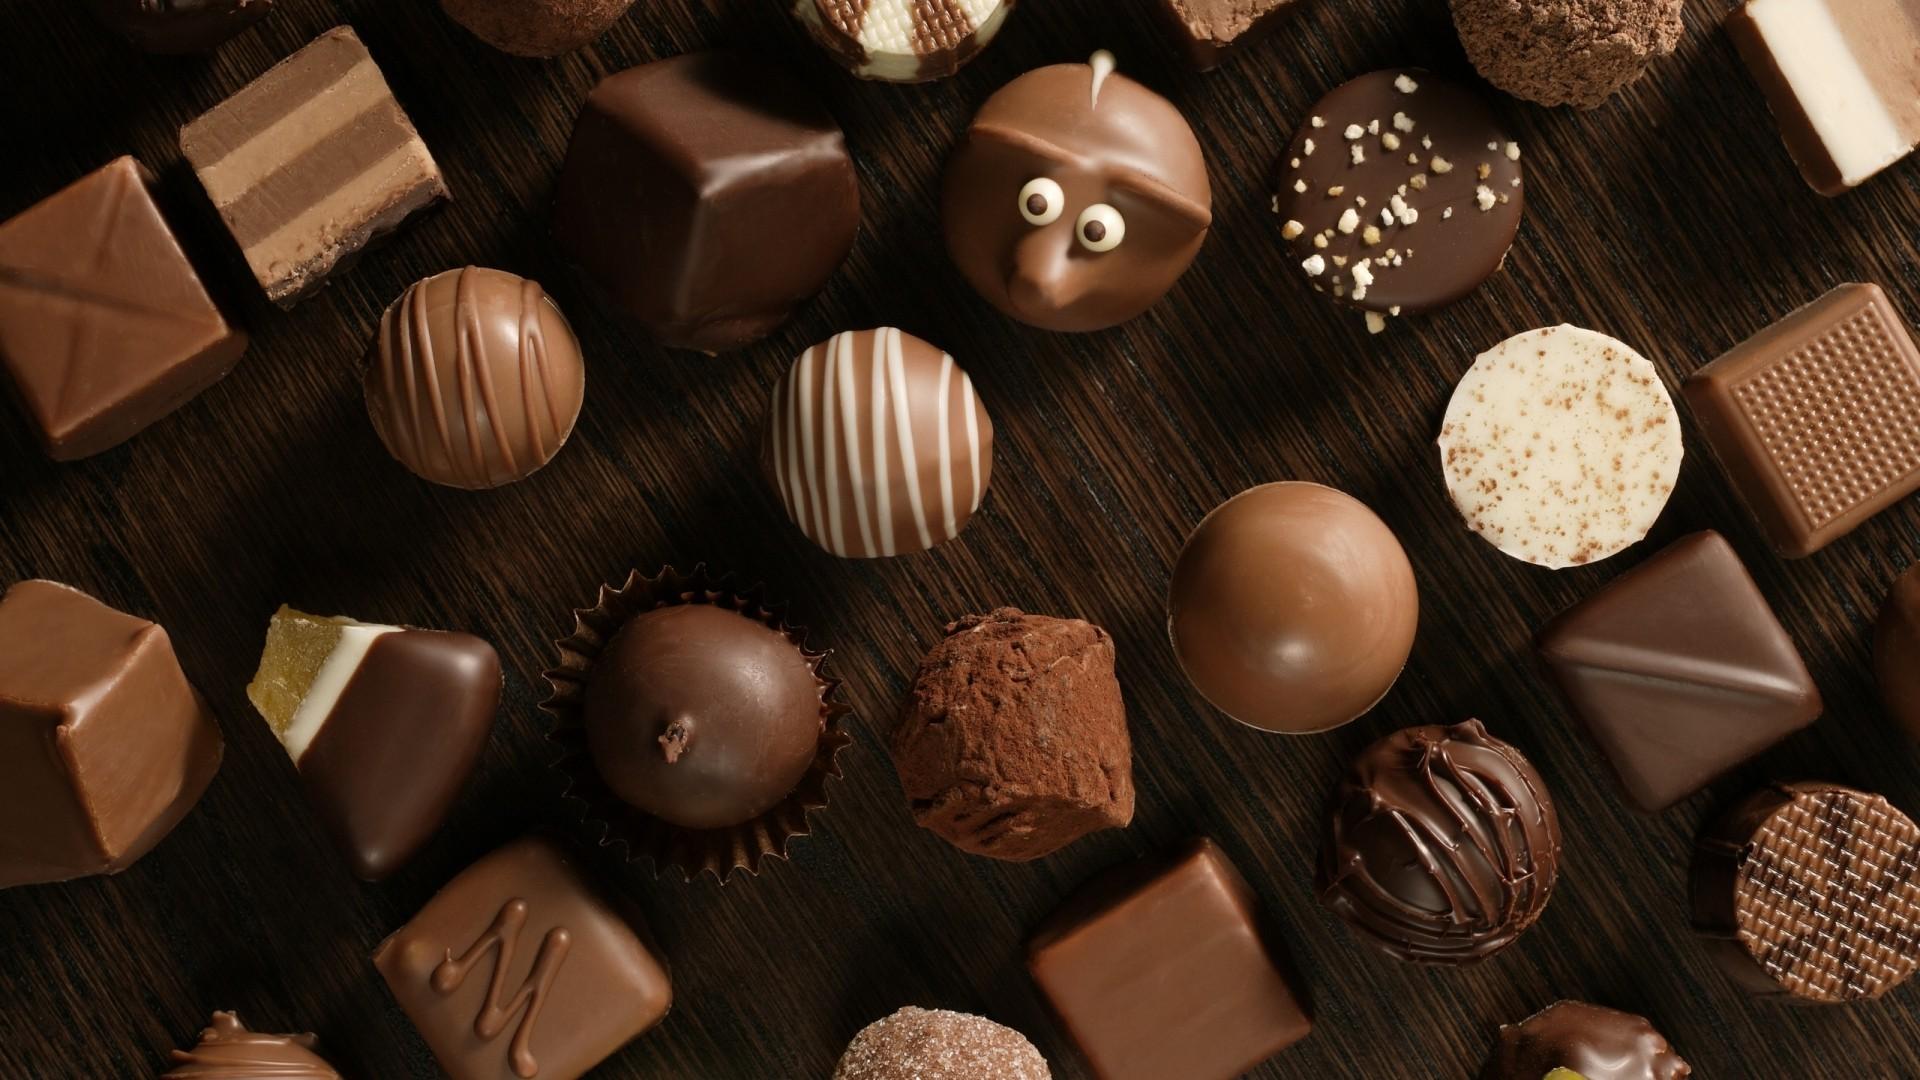 Chocolate wallpaper 4186 1920x1080